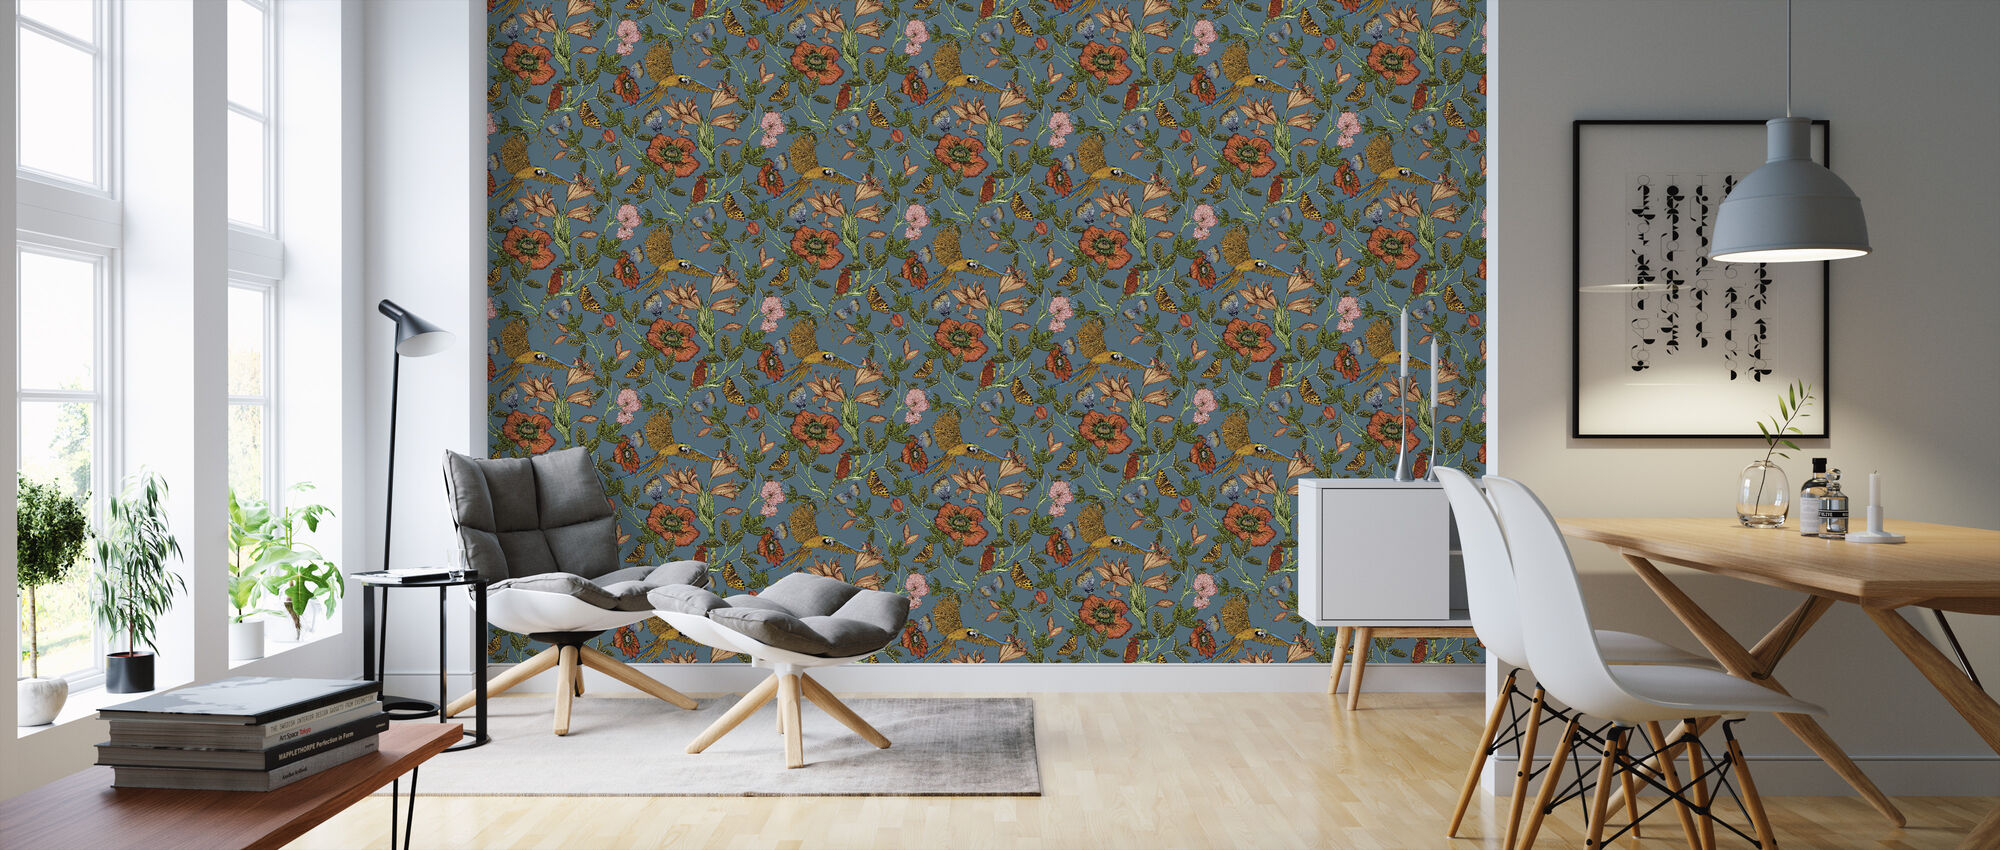 Parrot Blue - Wallpaper - Living Room